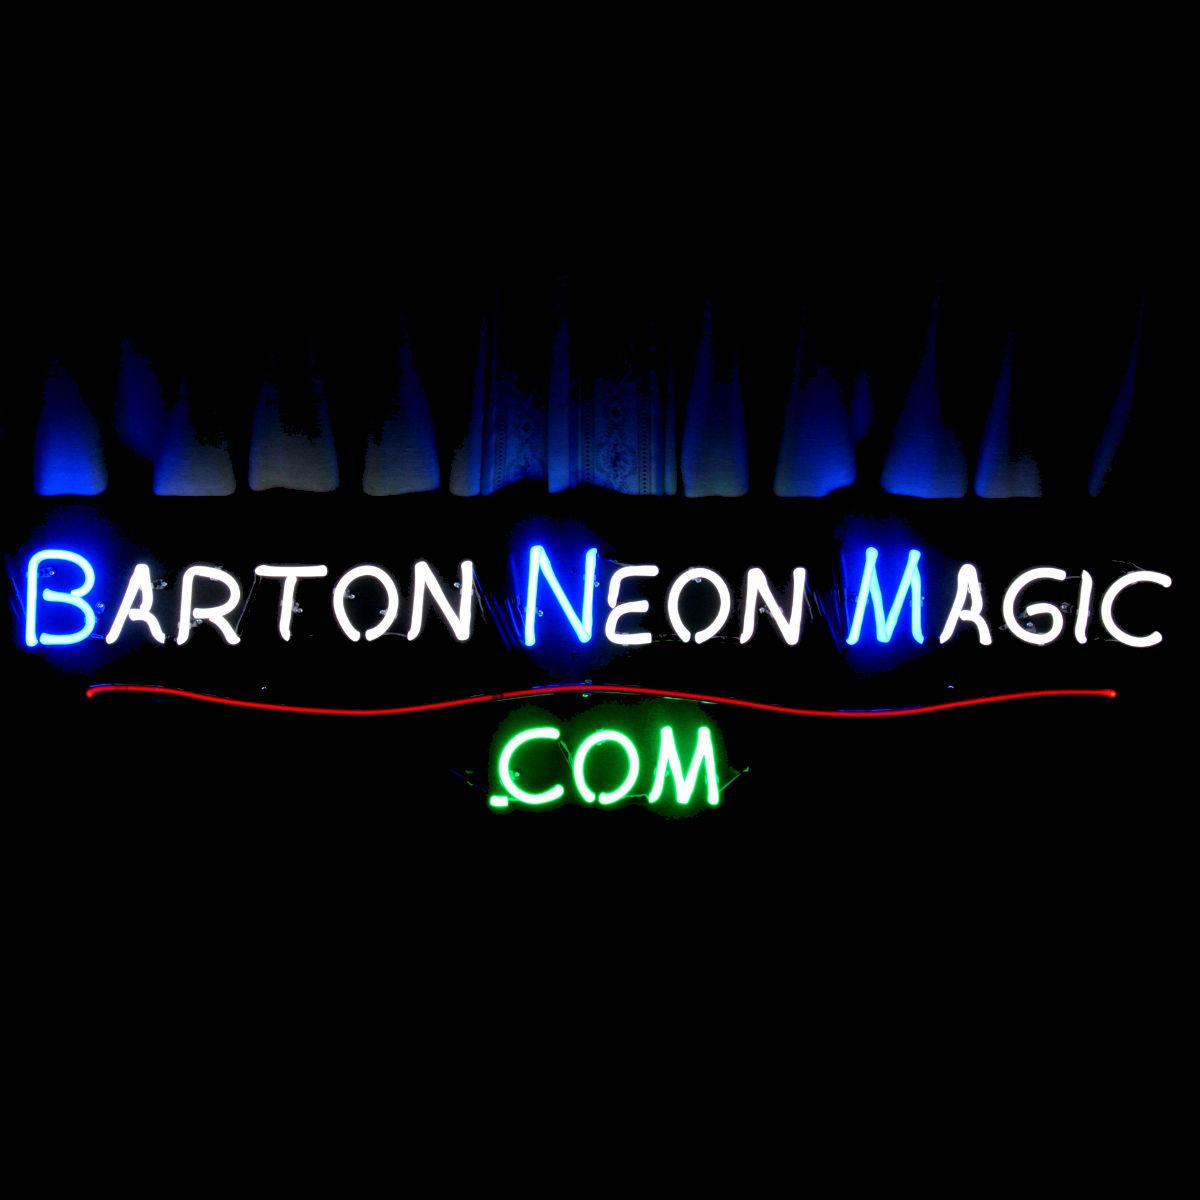 Designer Neon Artworks, Sculptures, and Chandeliers by John Barton - BartonNeonMagic.com